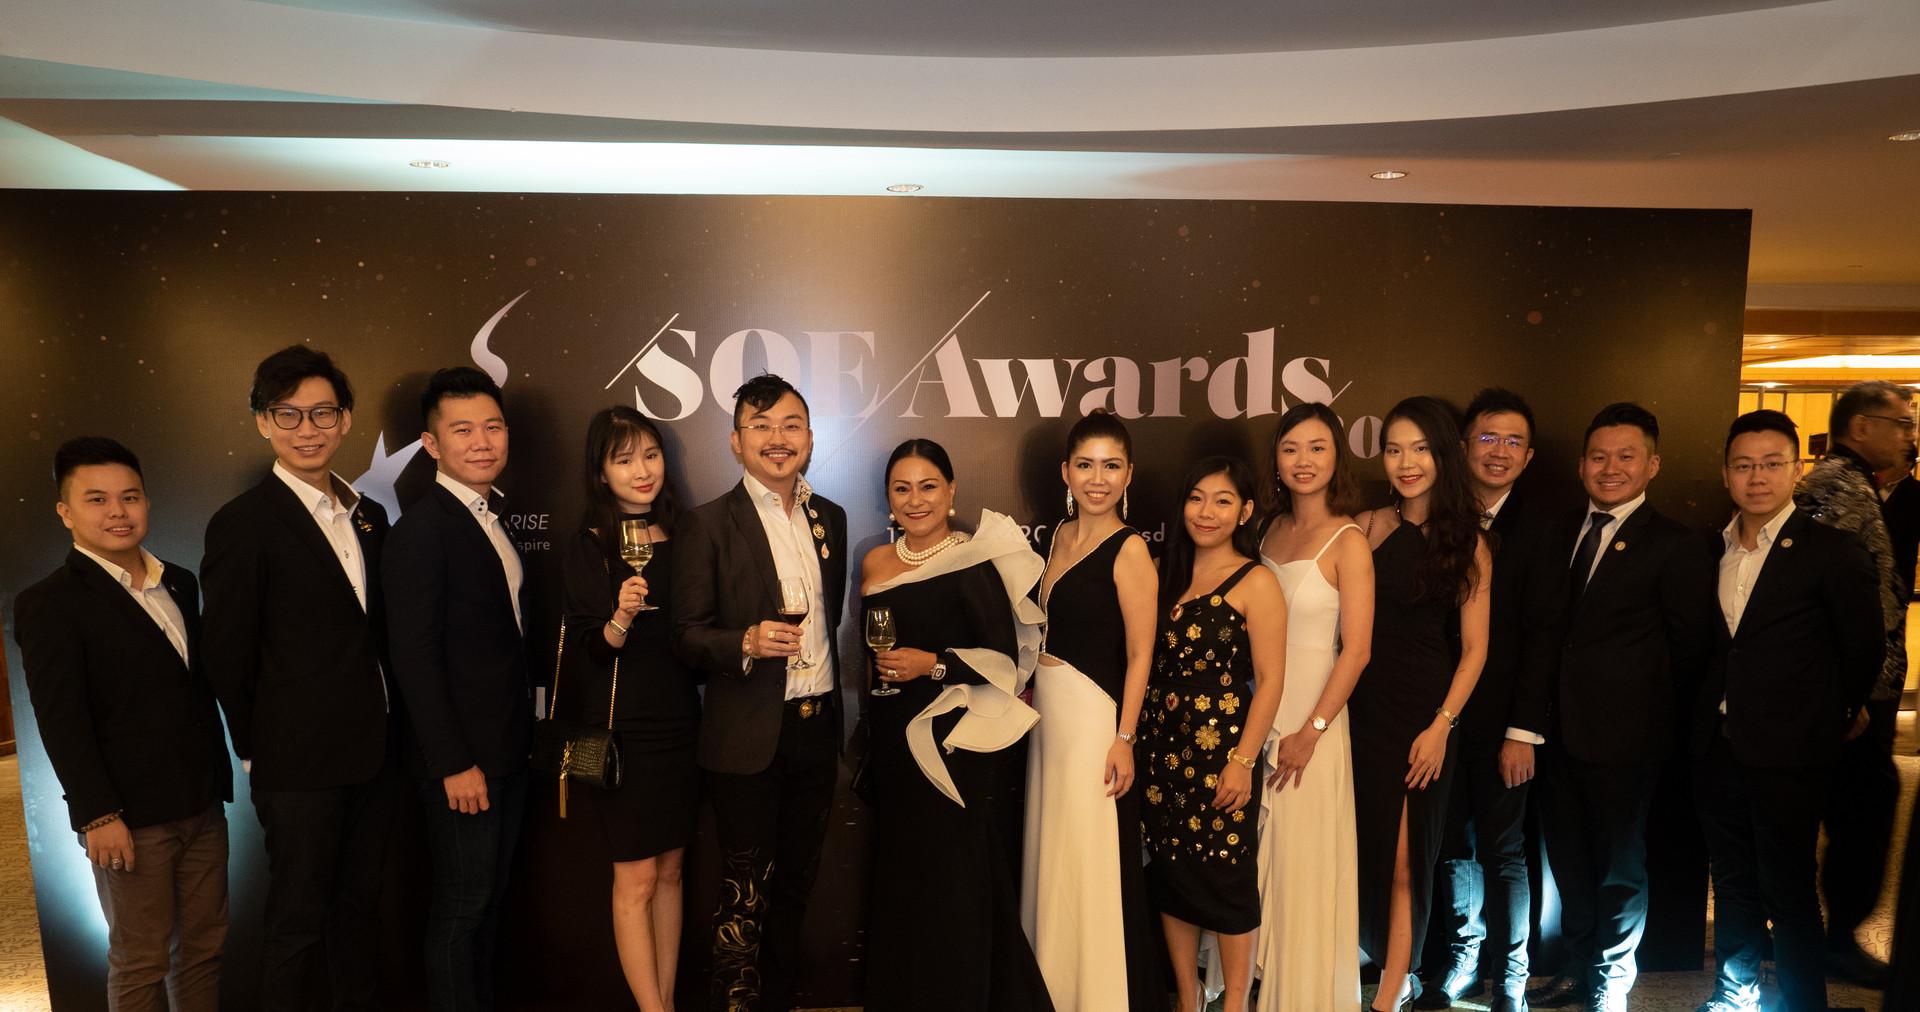 Spirit of Enterprise Awards 2019